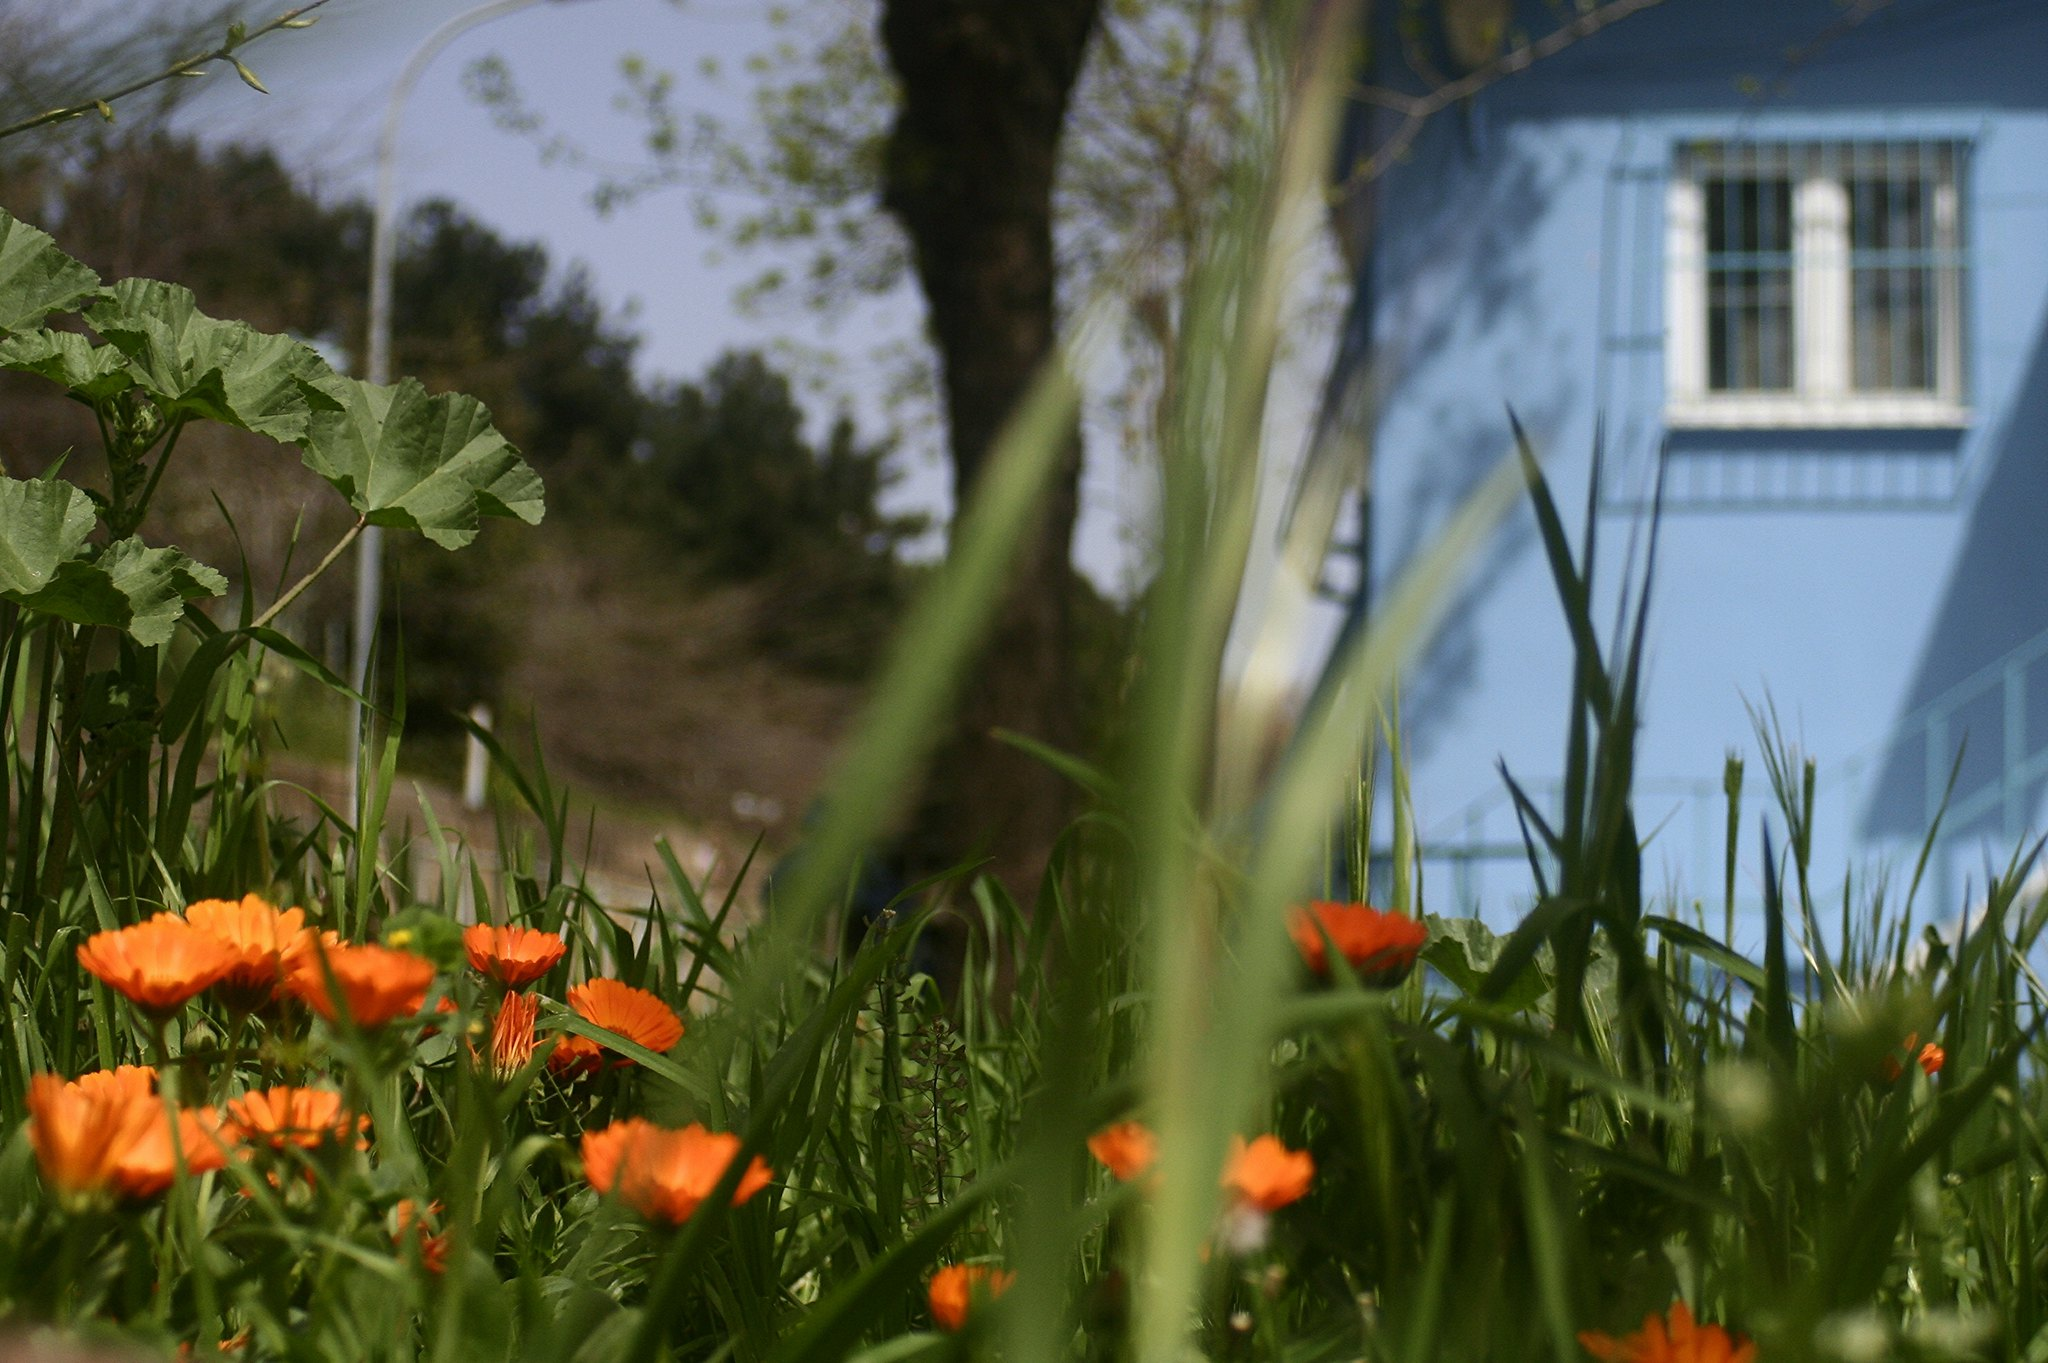 Orange flowers, blue house